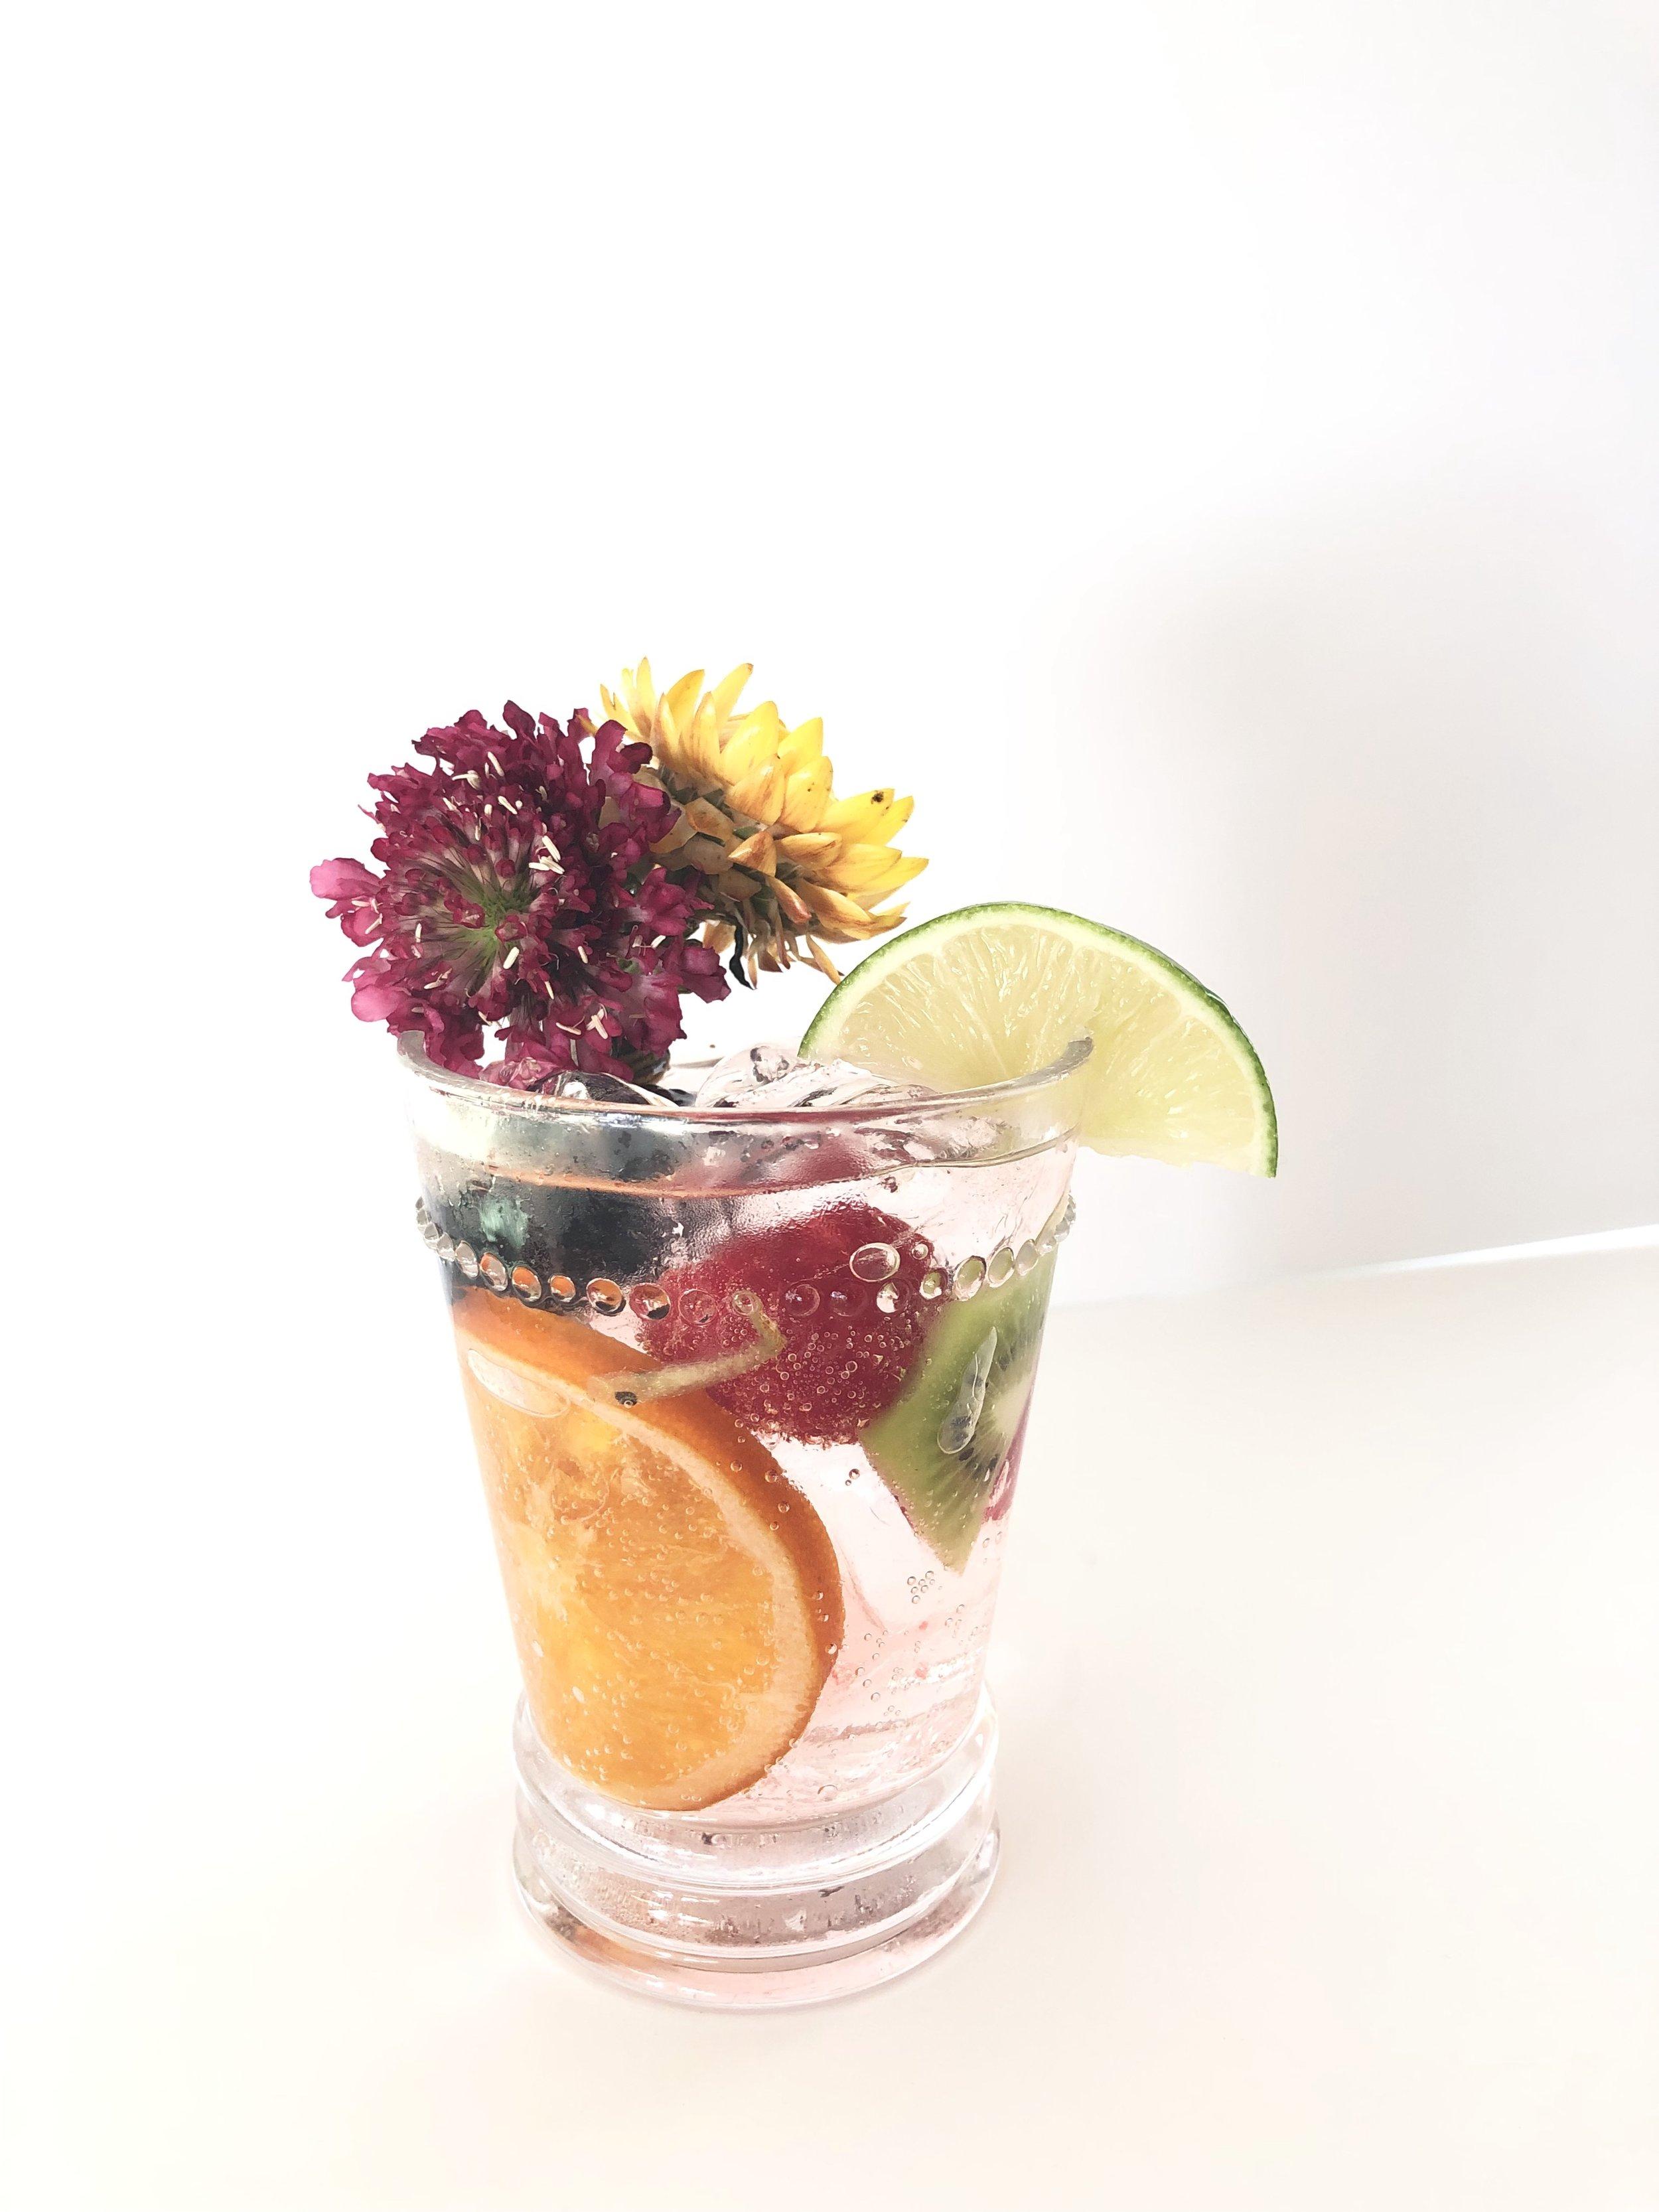 Super Tonic - 2 1/2 oz Tito's VodkaFever-Tree Tonic WaterCombine Vodka and Tonic.Add:RaspberriesBlackberriesKiwiLimeCandied OrangeMuddle Dragon Fruit and Simple syrup. Add Gin. Shake Shake Shake. Strain. Add to glass. Top with tonic water.